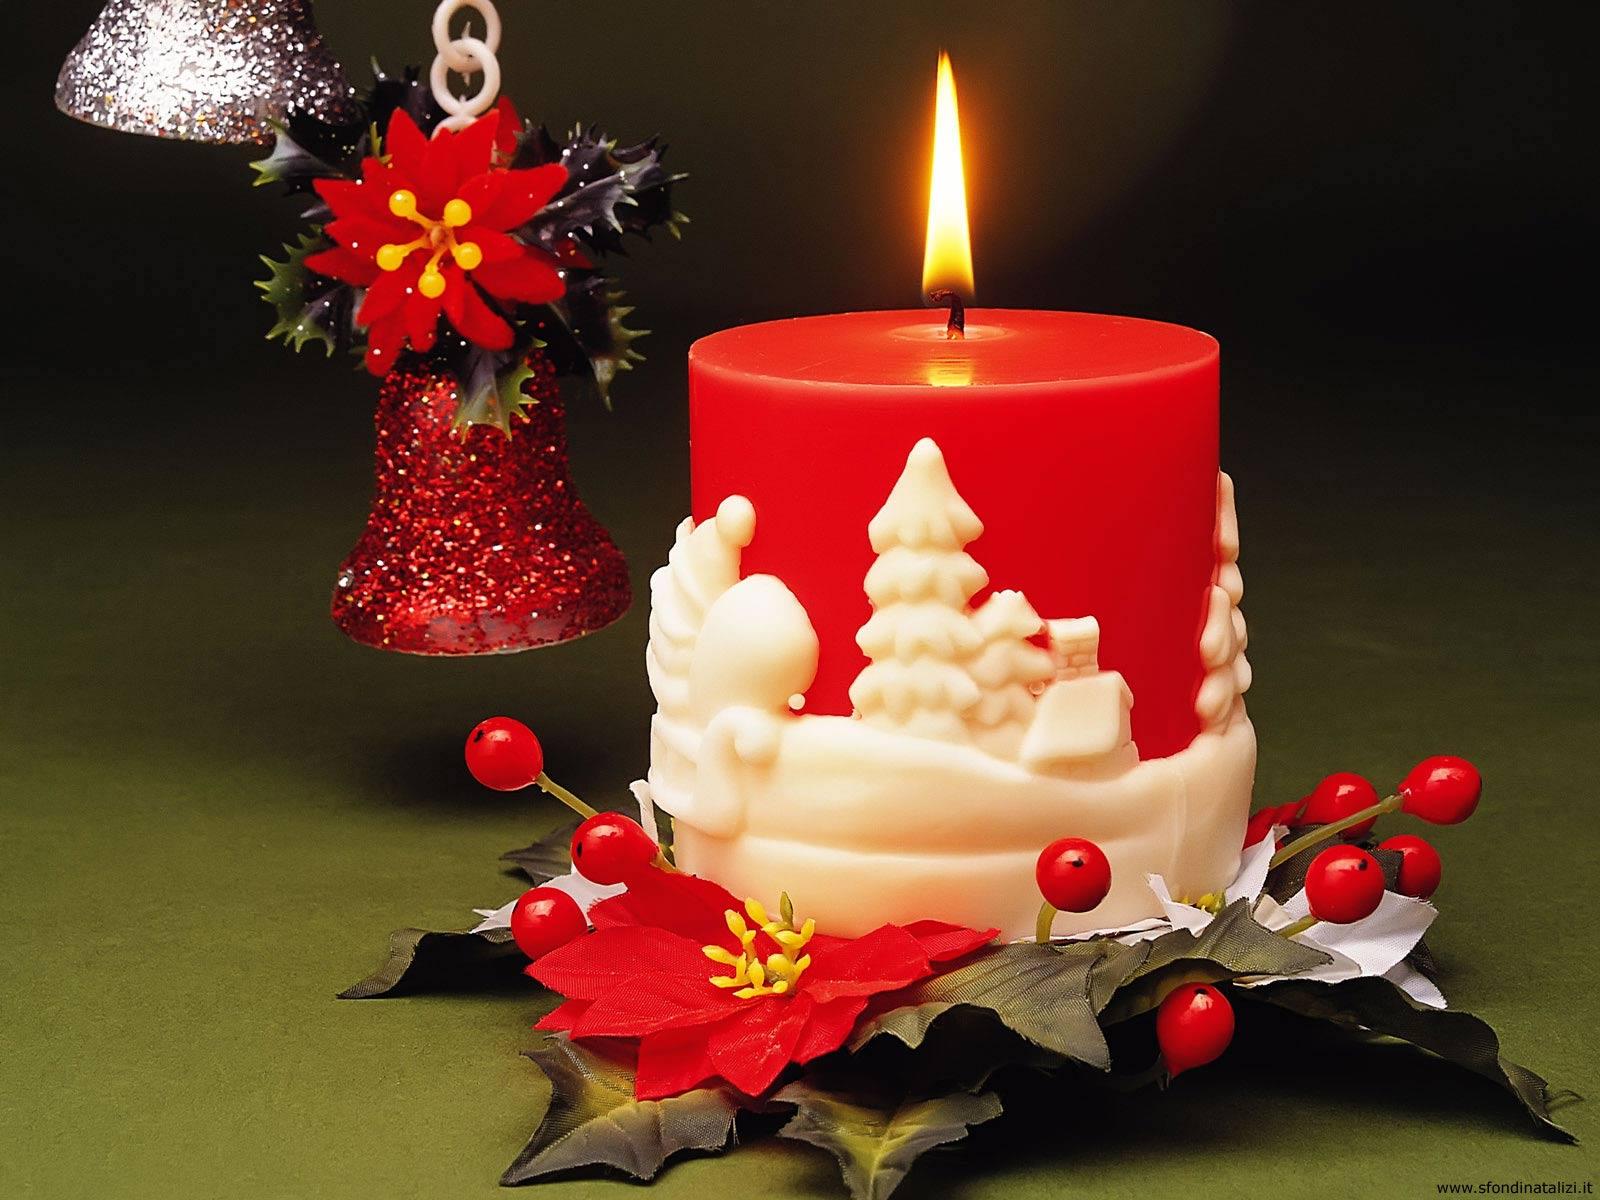 Sfondo Natalizio - Sfondi Desktop Candela Natale